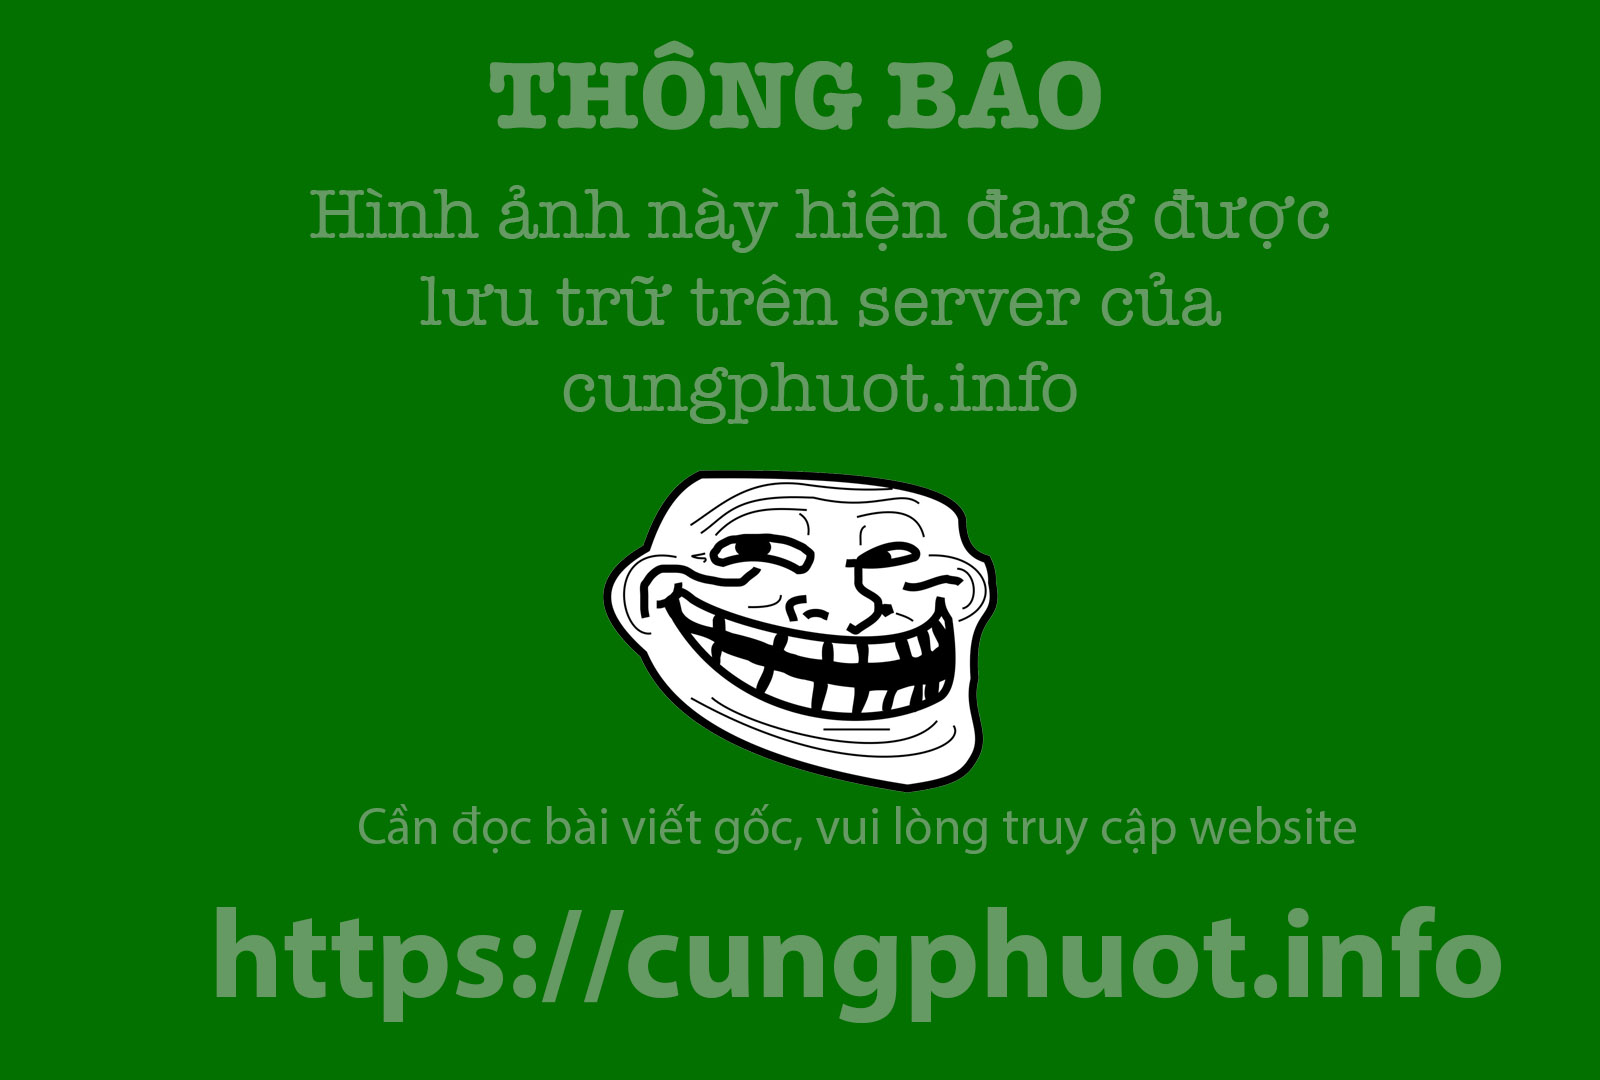 Ly Son: Nguon goc so khai va nhung dieu can thay doi hinh anh 2